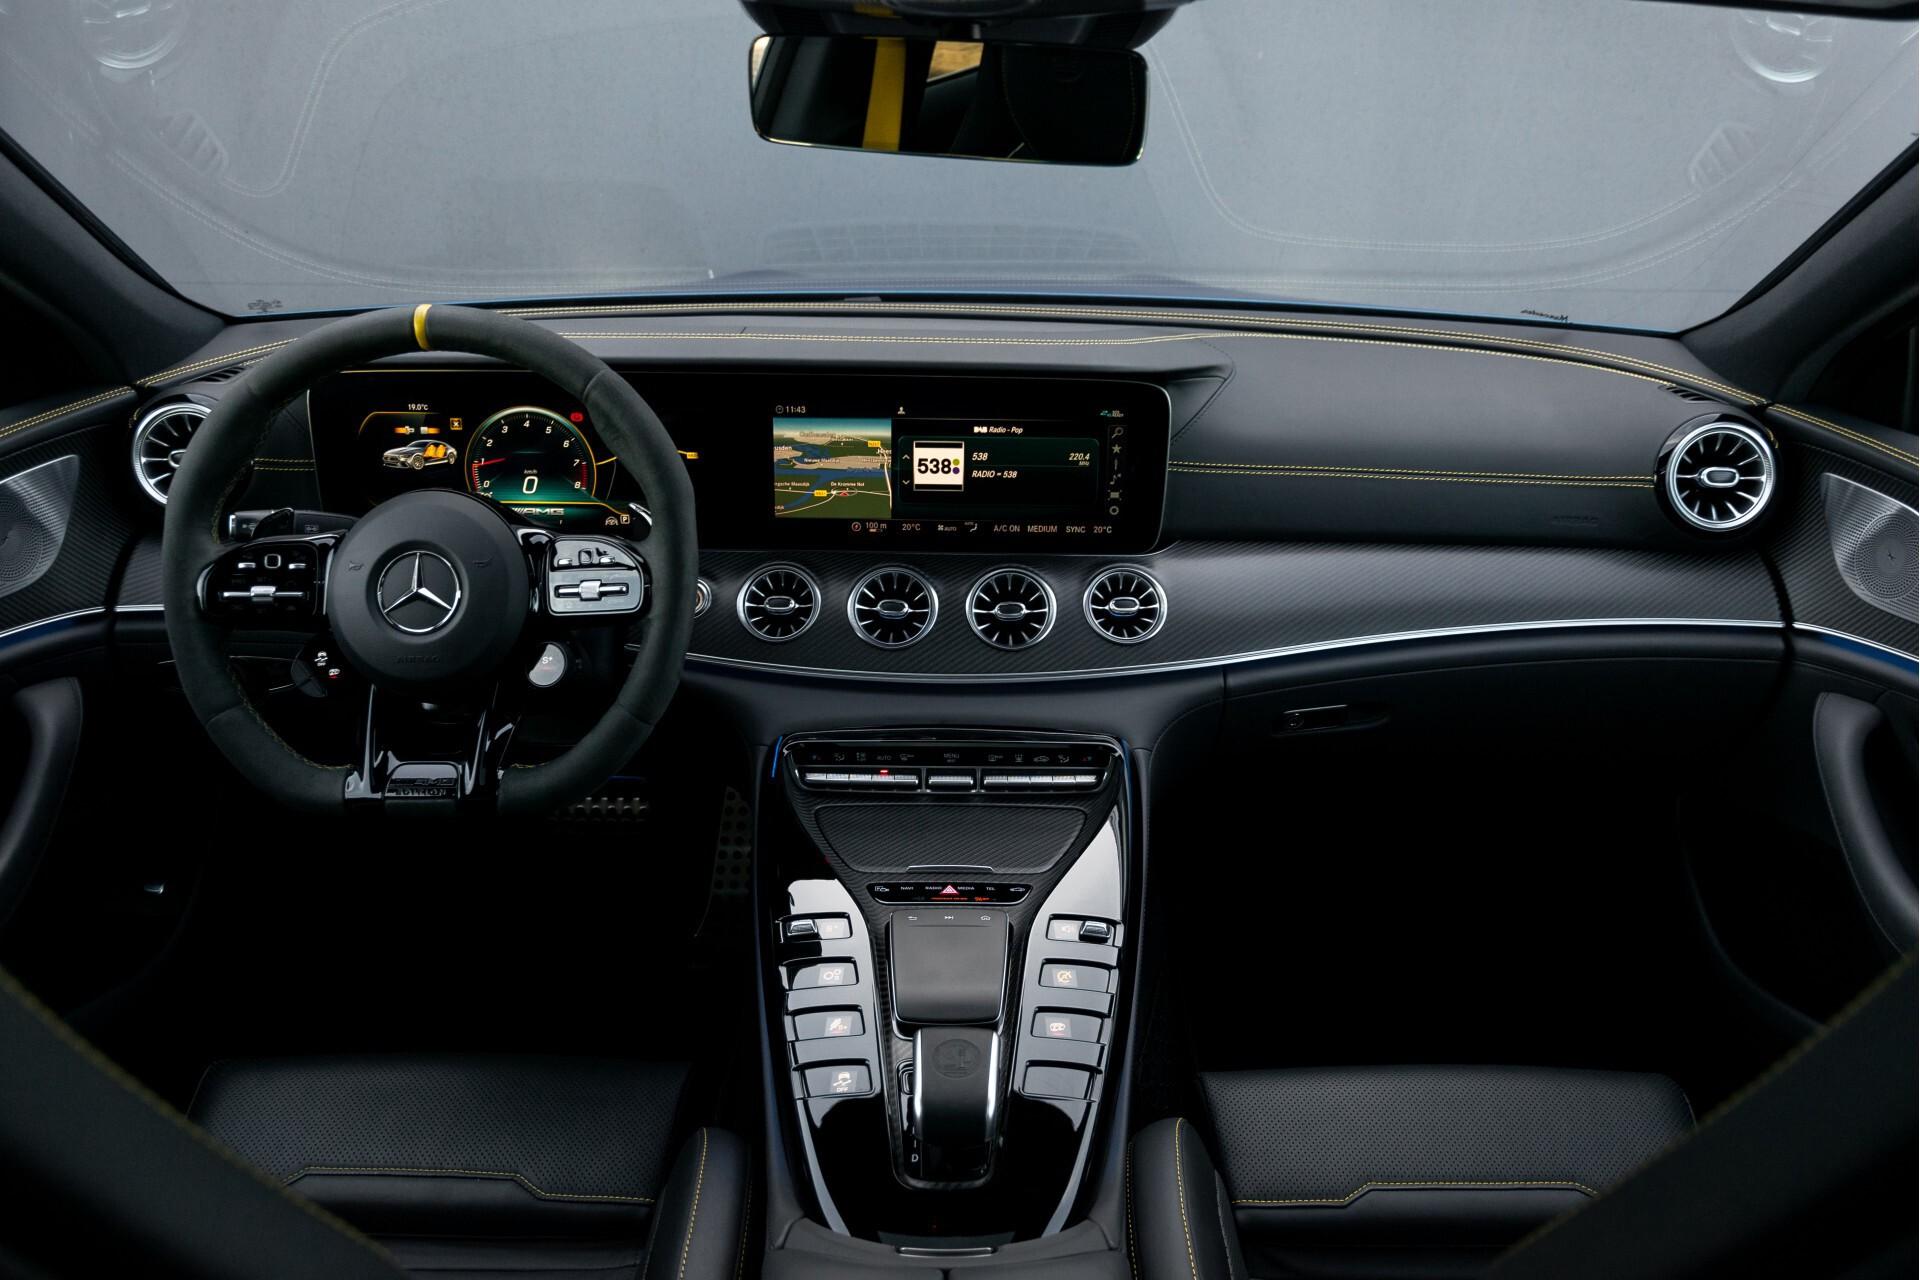 Mercedes-Benz AMG GT 4-Door Coupe 63 S 4MATIC+ Edition 1 Keramisch/Carbon/First Class/Dynamic Plus/Burmester High End 3D Aut9 Foto 9